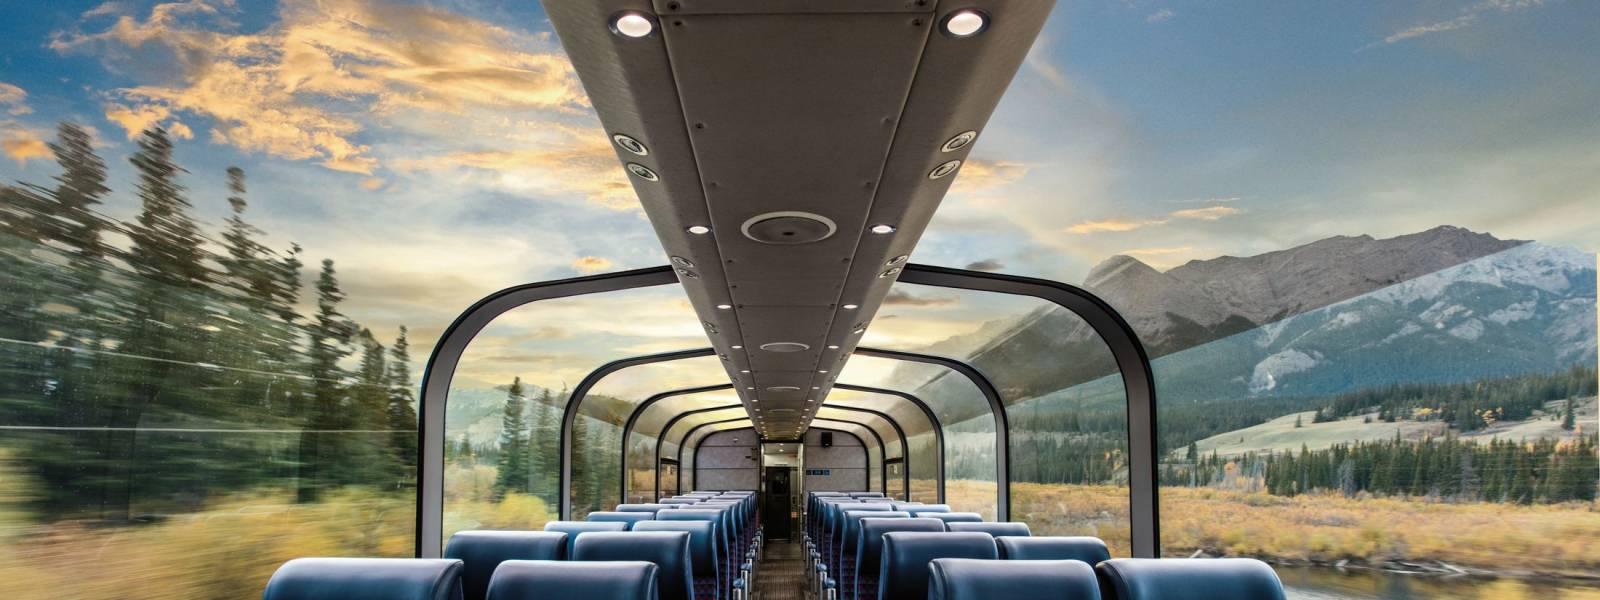 Rail The Canadian Skyline Car Panoramic Rockies Views